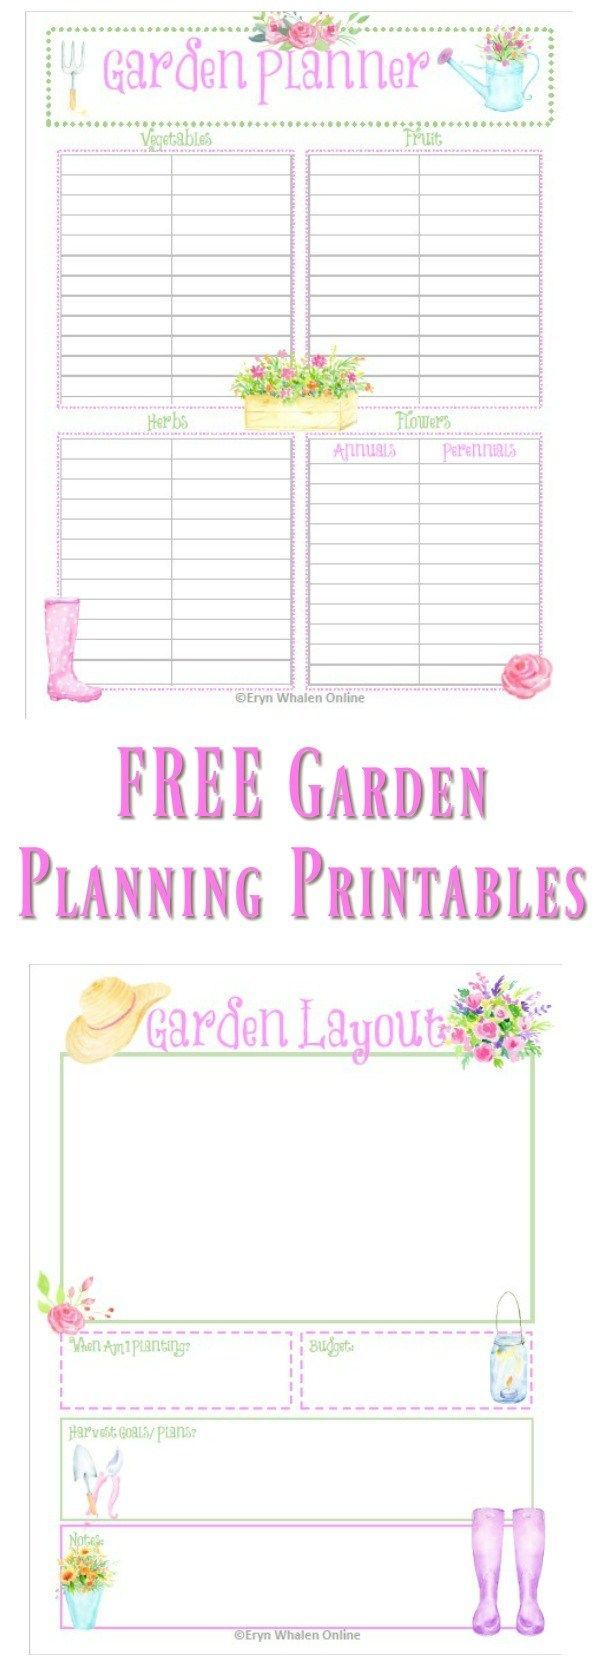 Free vegetable garden planner online - Best 25 Allotment Planner Ideas On Pinterest When To Plant Vegetables Allotment Meaning And Garden Layout Planner